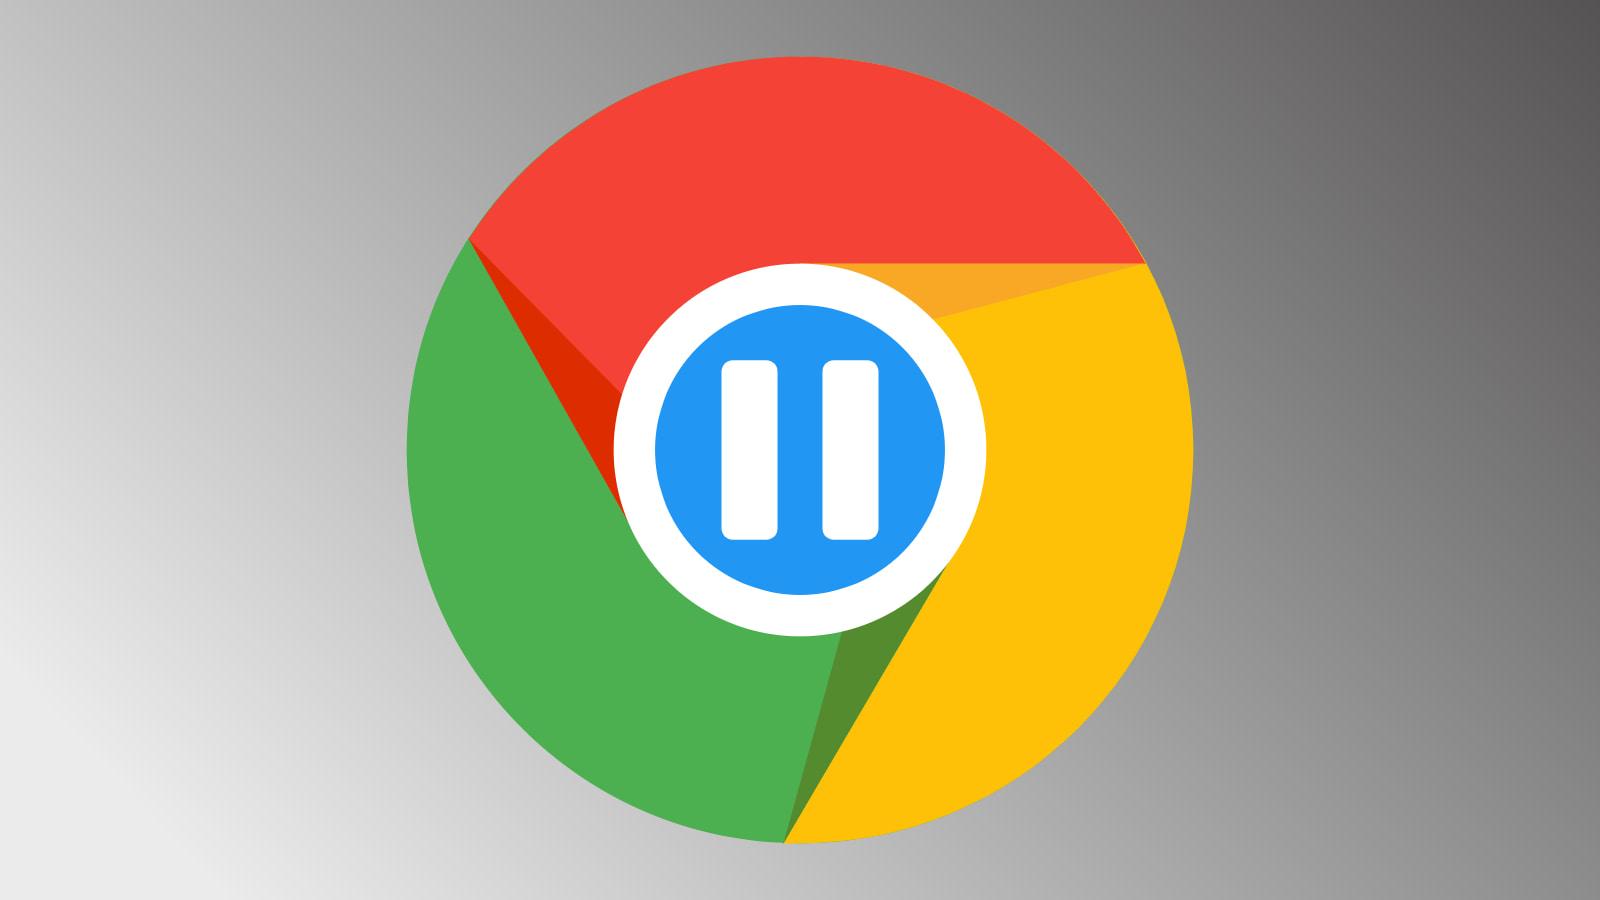 Coronavirus, si fermano anche Chrome e Chrome OS